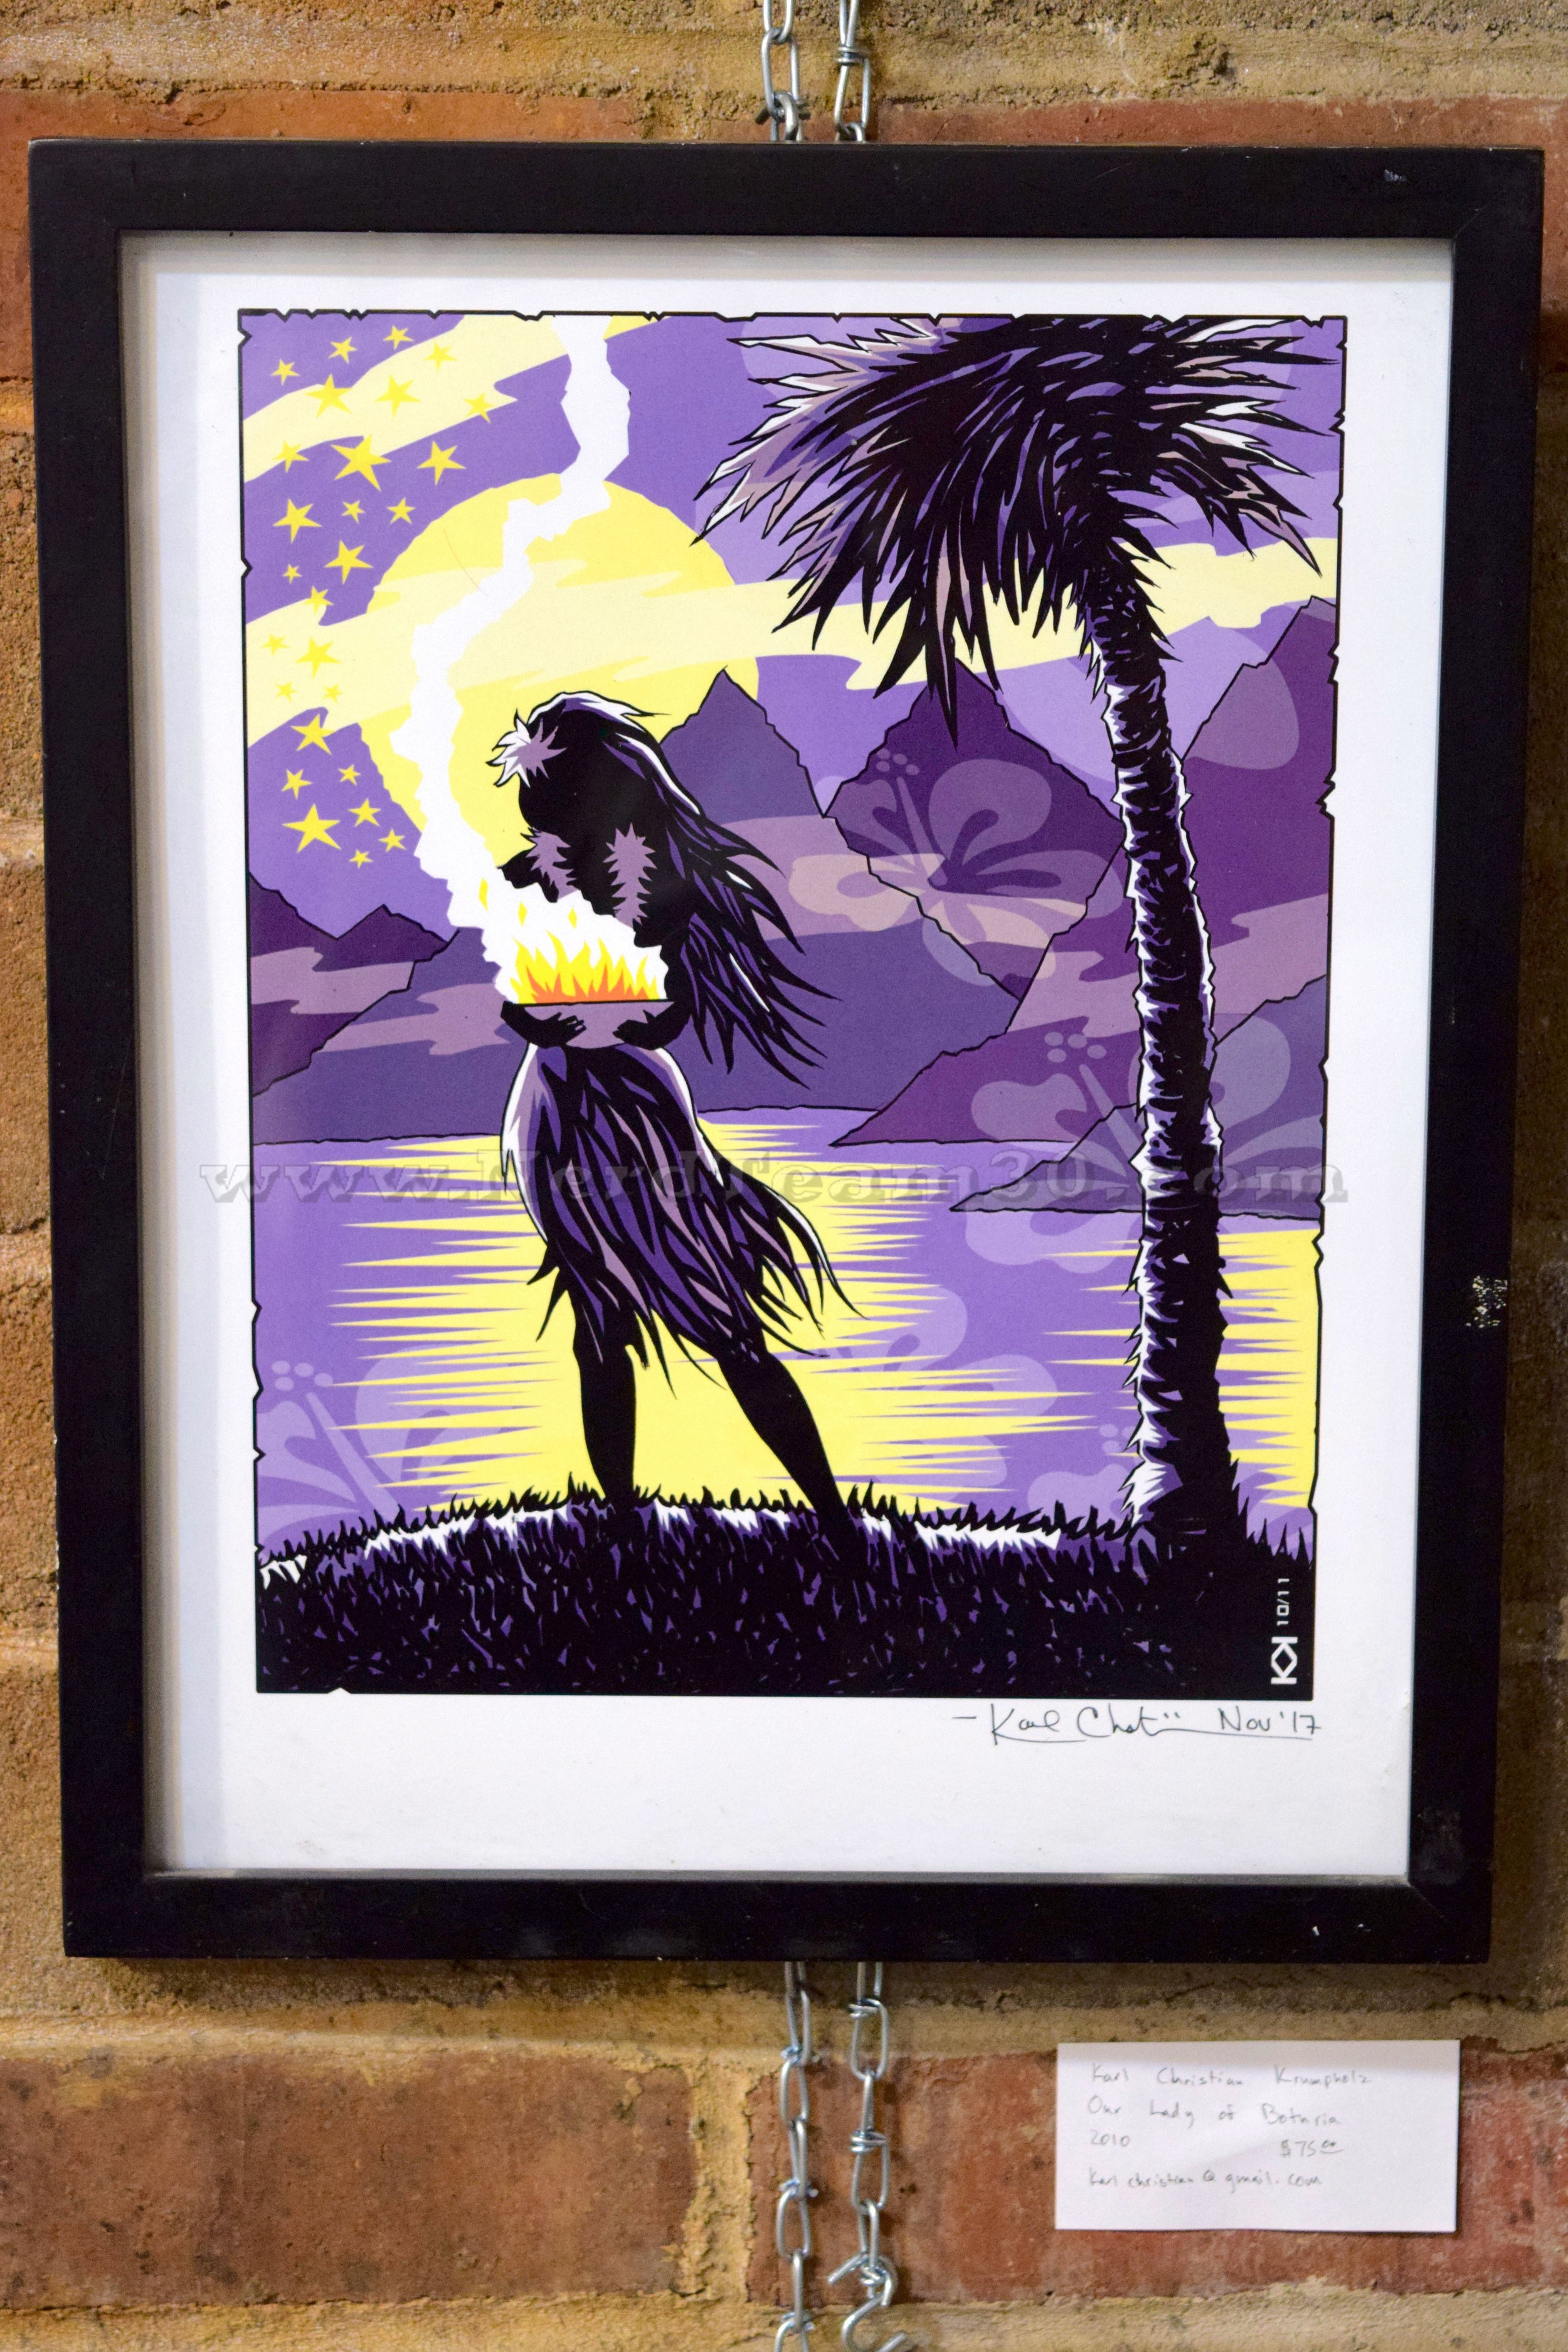 "Karl Christian Krumpholz ""Our Lady of Bothria"" 2010   $75 KarlChristian@gmail.com"